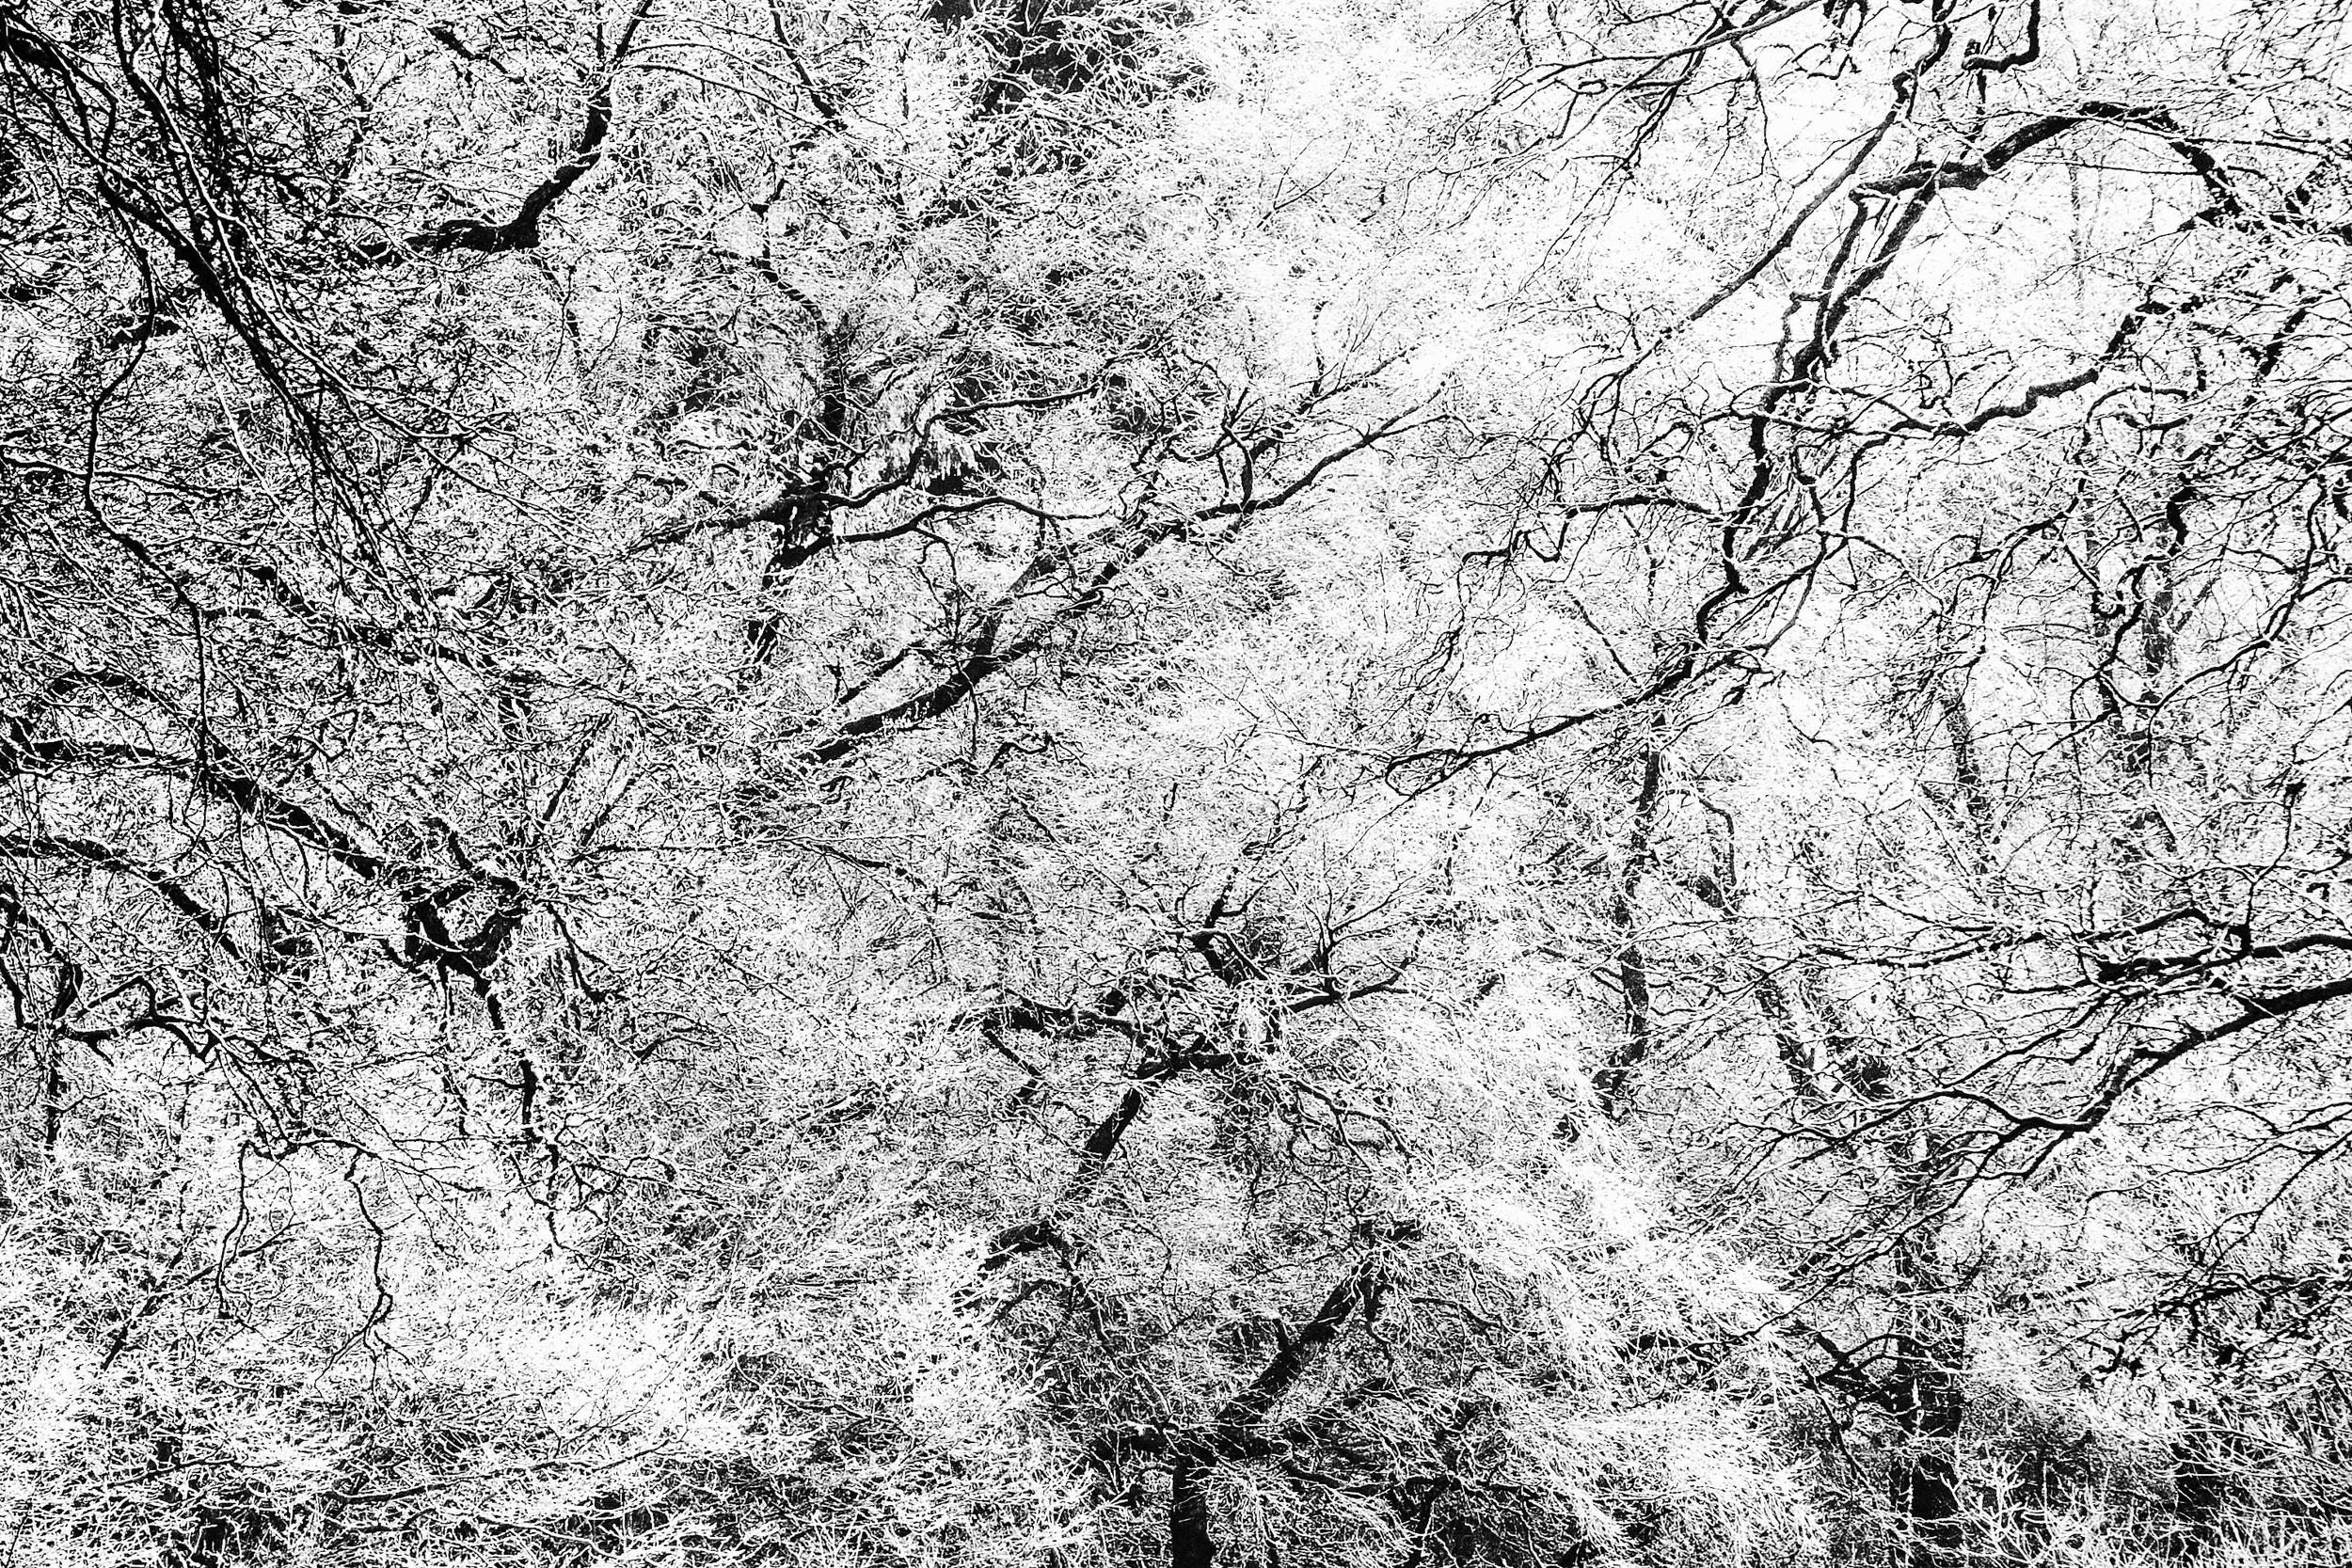 """Hoar Frost"" - Brecon Beacons, South Wales Fujifilm X-T1 + 18-135mm f/3.5 - f/5.6 @ f/13. 1/160"